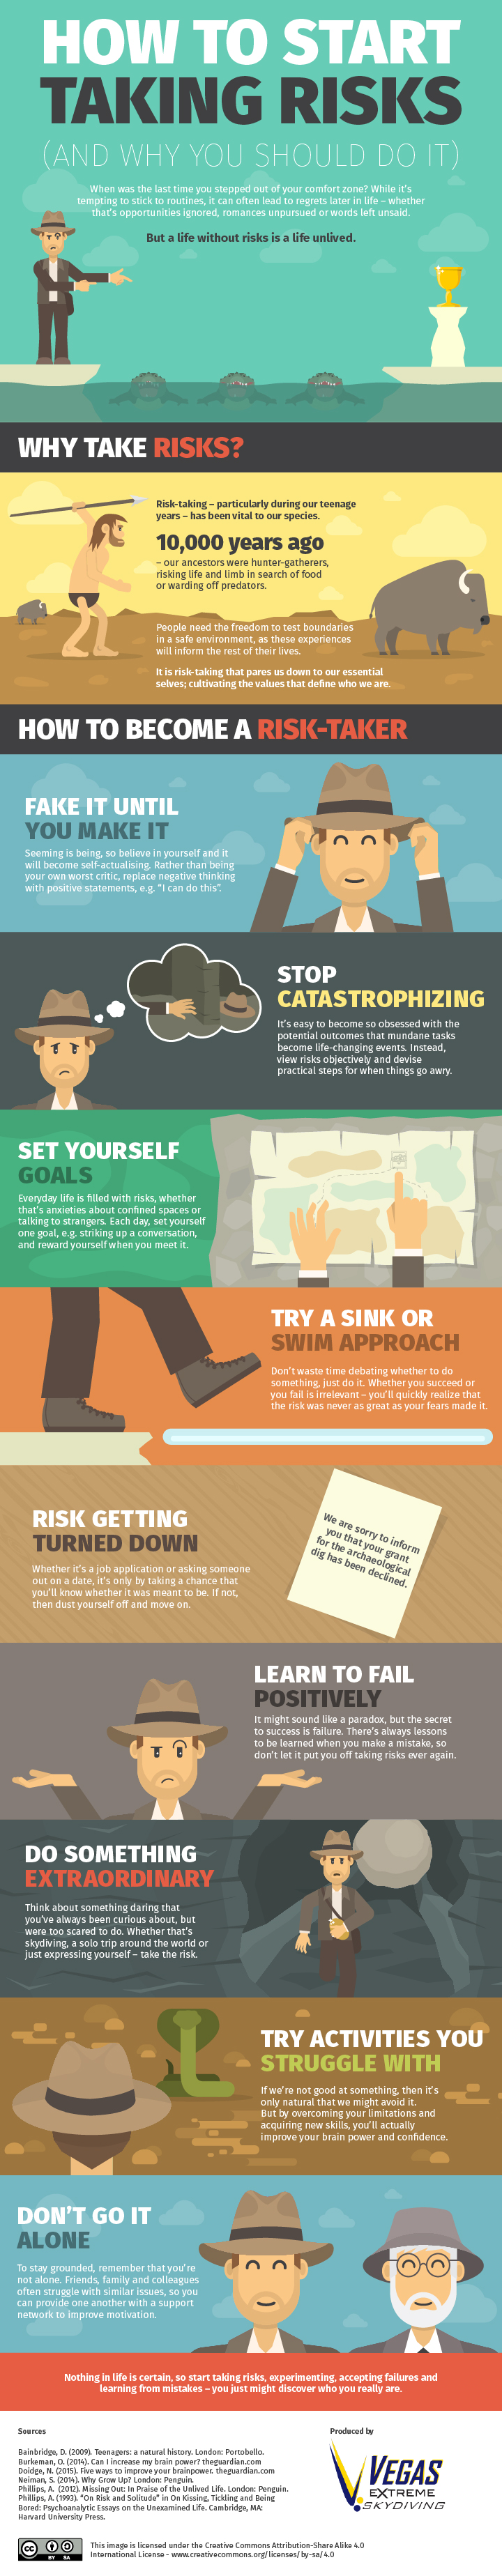 Taking Risks Infographic